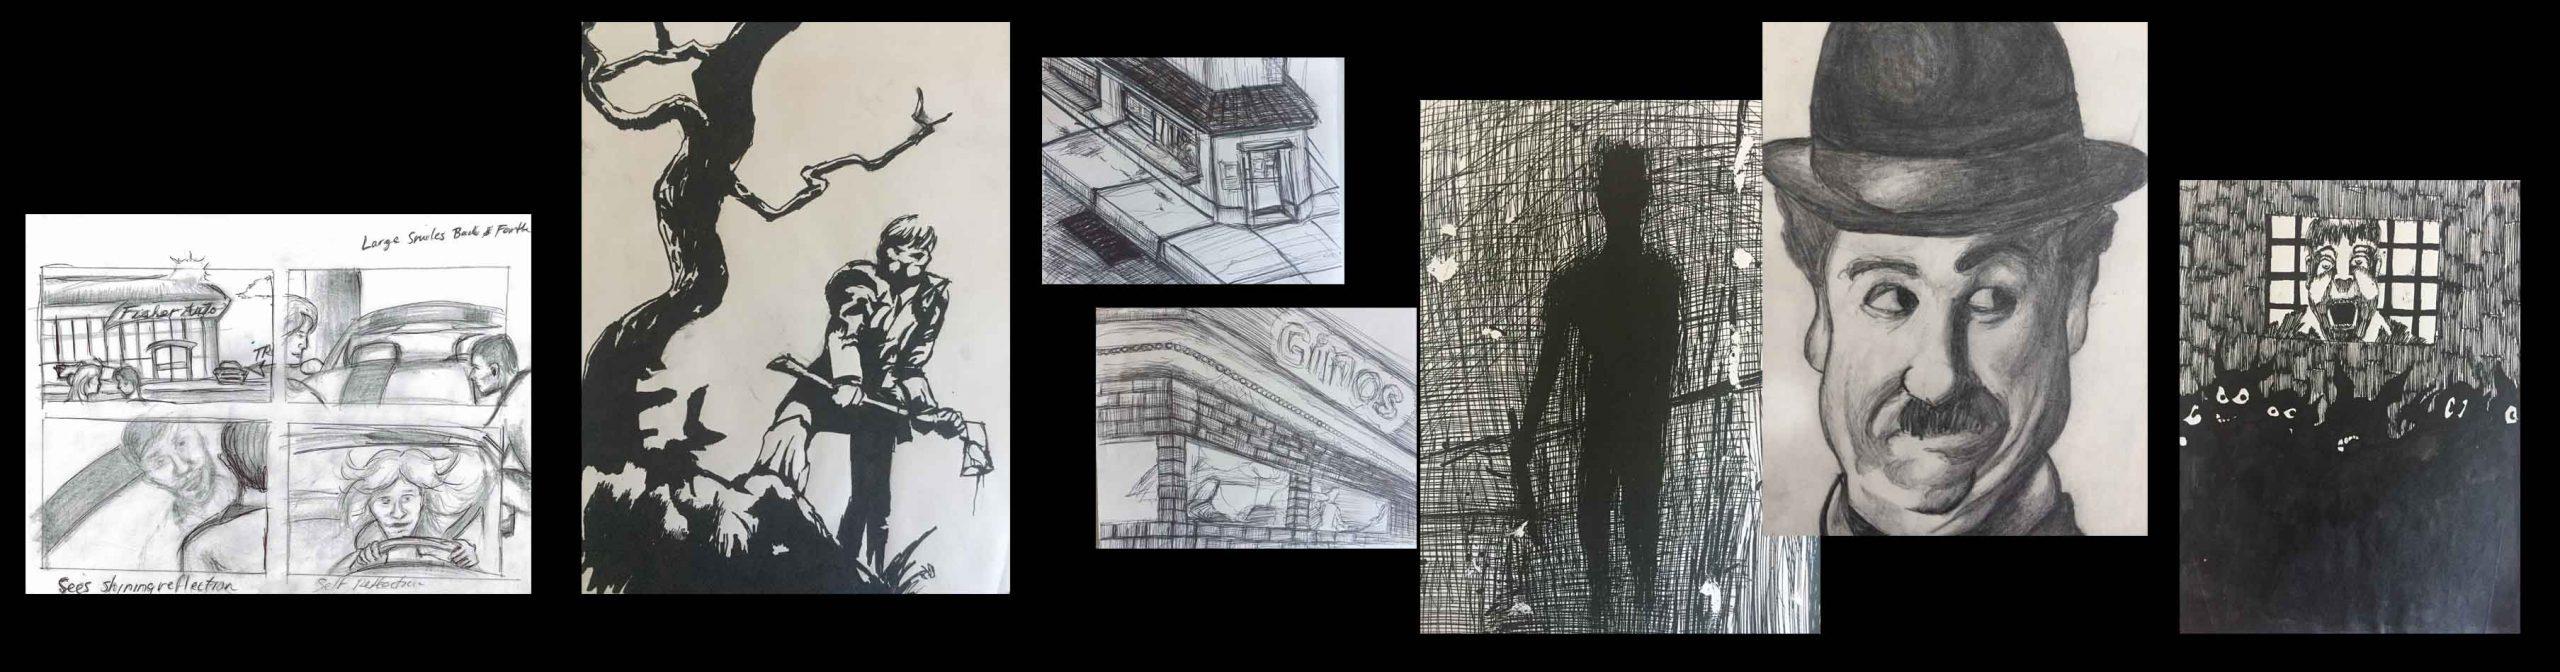 Art by storyboard artist & concept artist Nicholas Teti III, Colorado USA